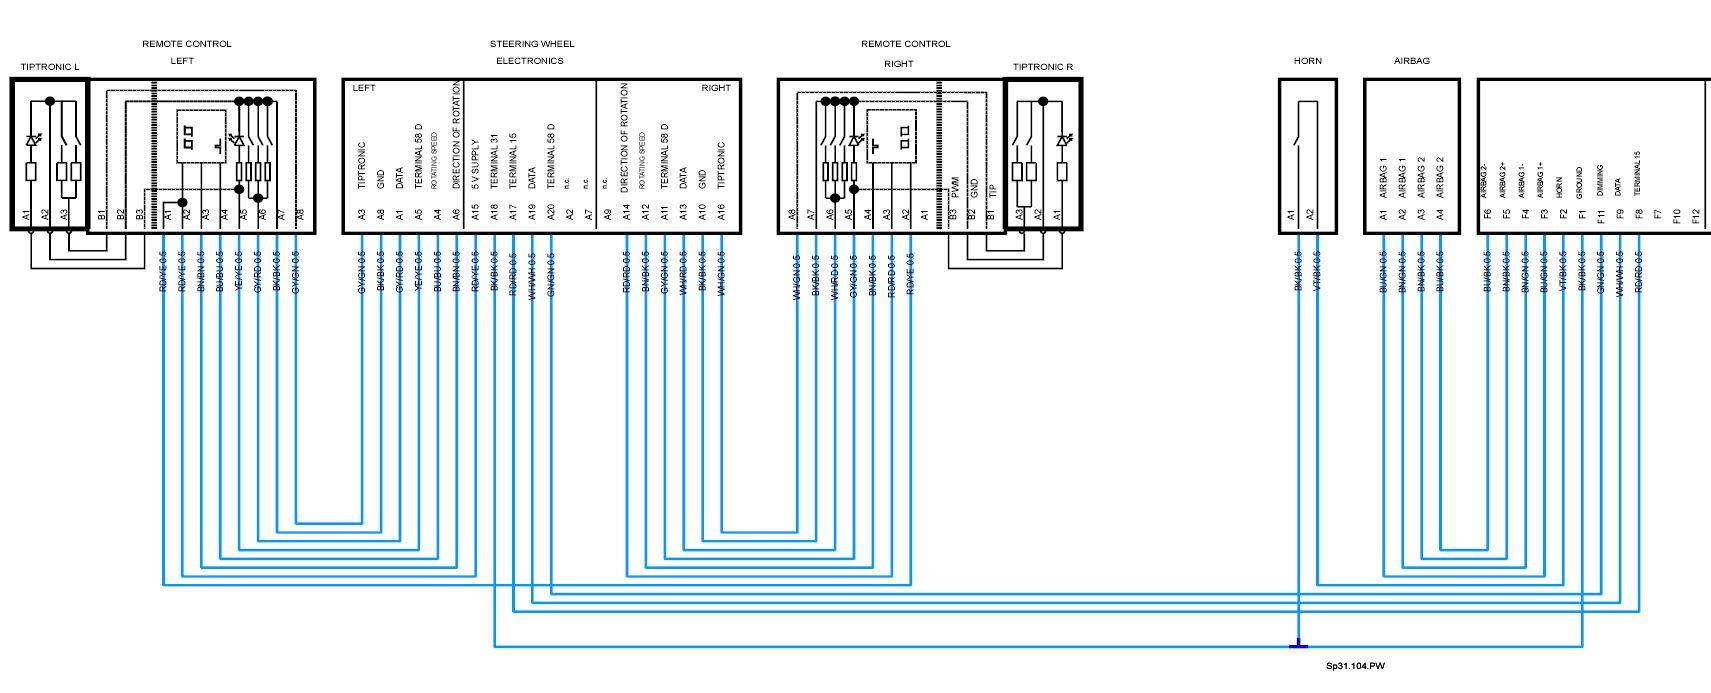 hight resolution of 86 toyota mr2 belt diagram guide and troubleshooting of wiring for 1985 lamborghini gallardo diagrams urraco